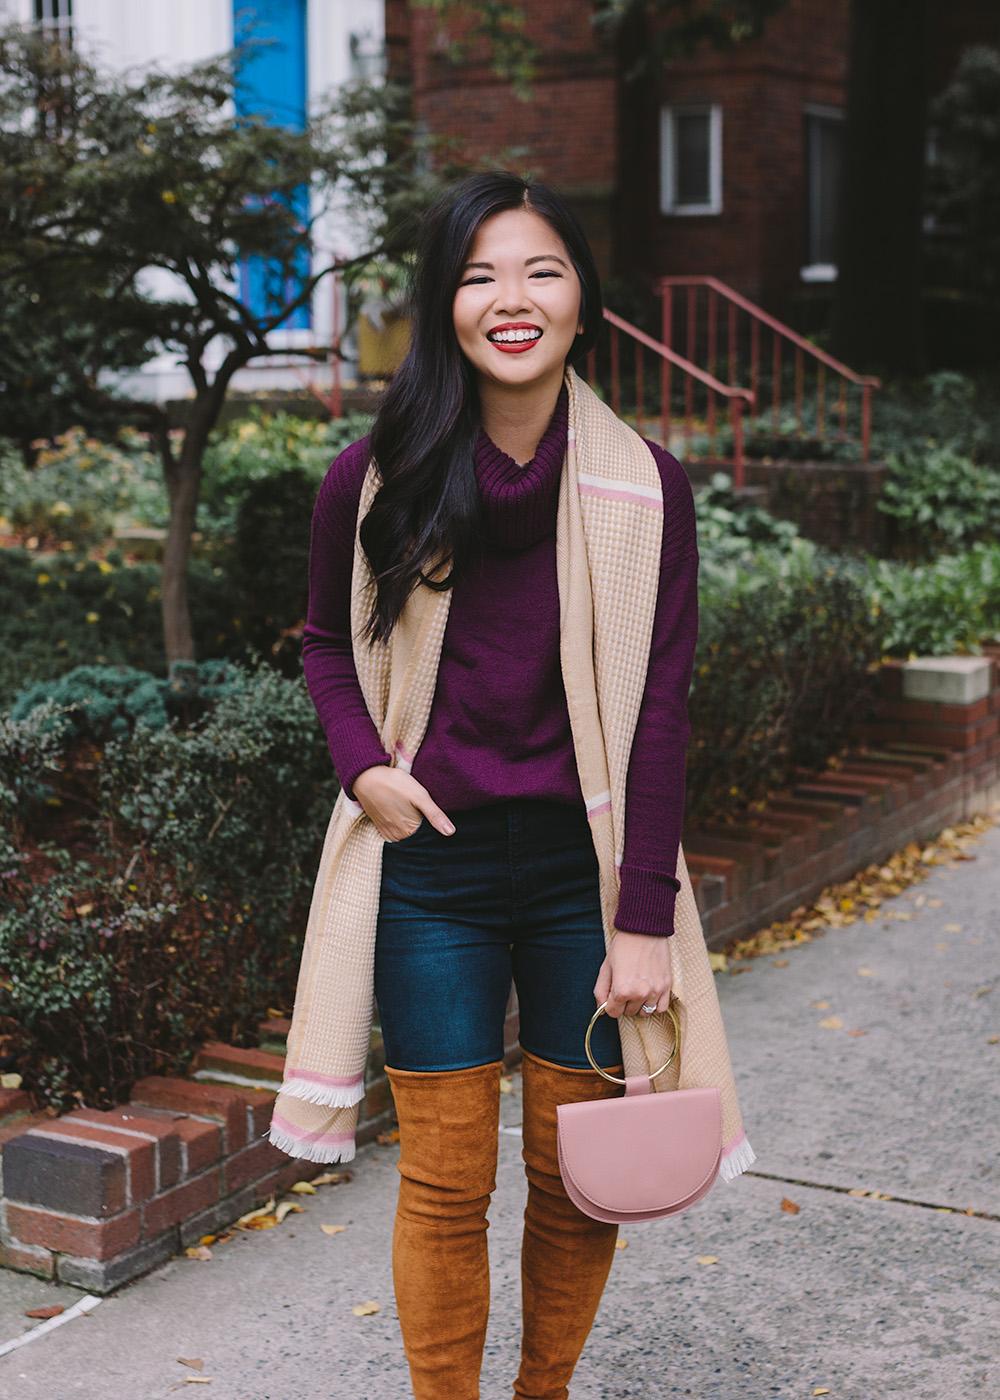 Fall Fashion 2018 / Turtleneck Sweater, Scarf & OTK Boots